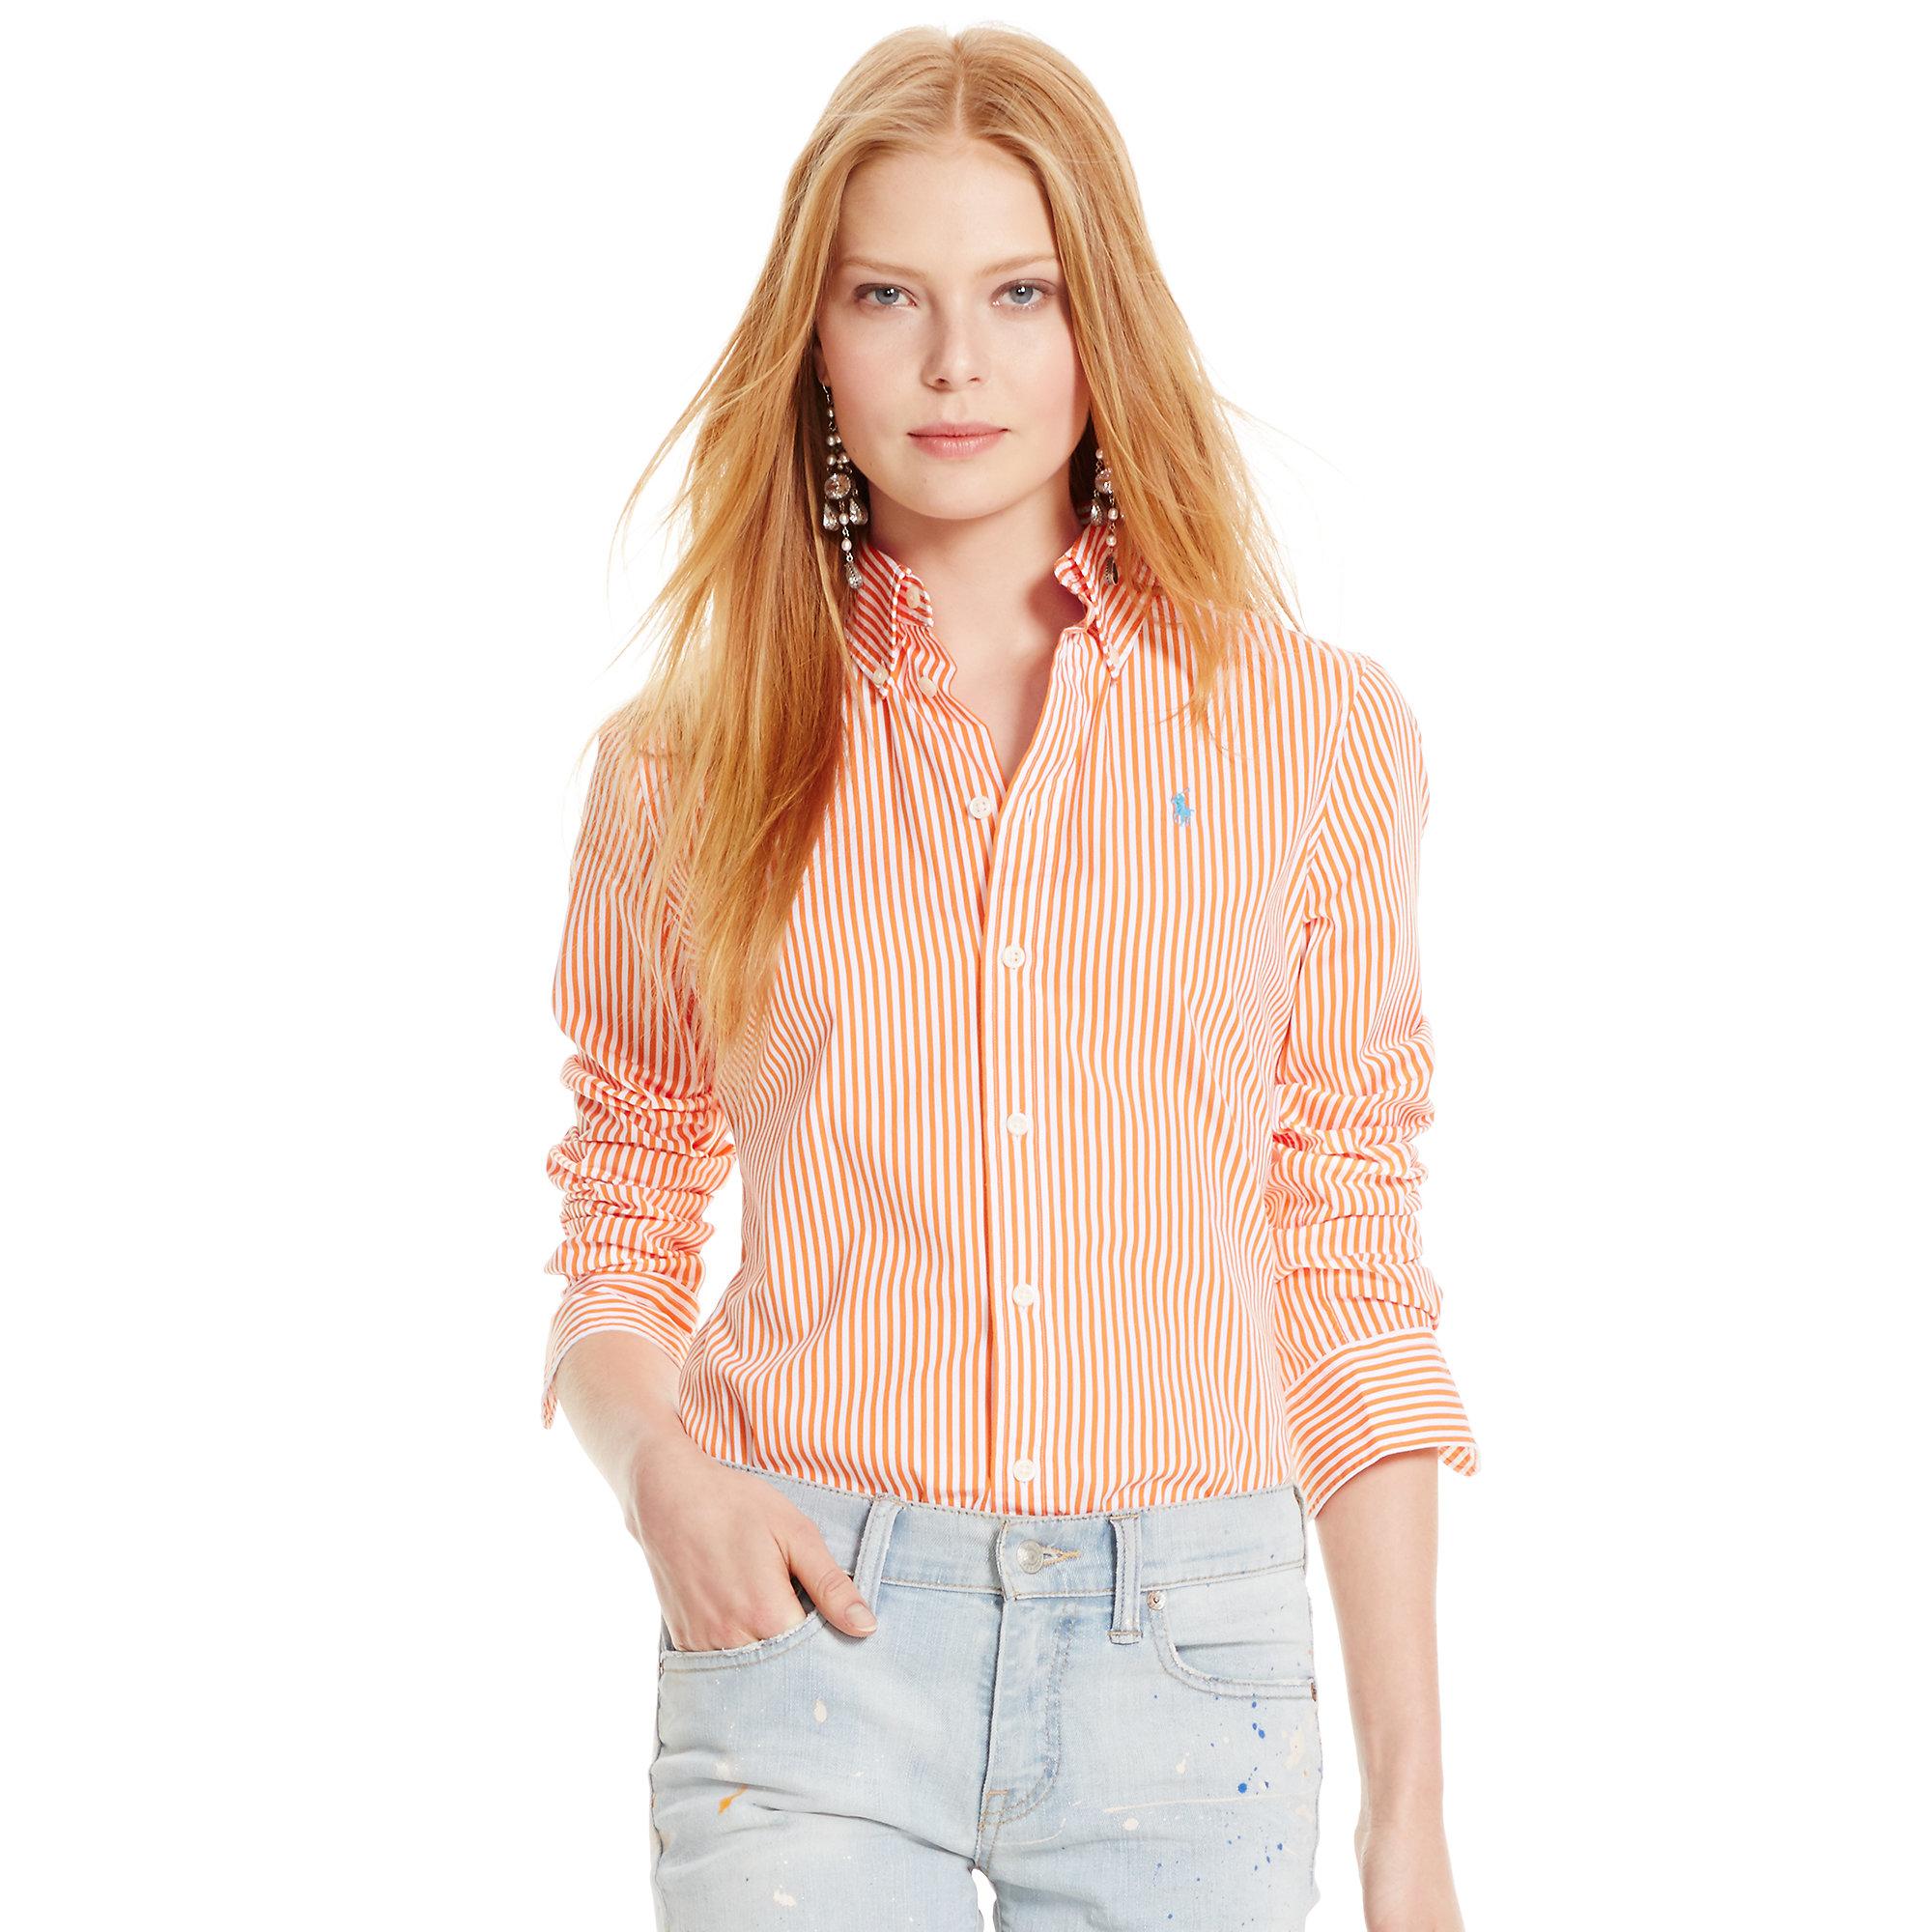 46c1effb30e Polo Ralph Lauren Custom-fit Striped Shirt in Orange - Lyst